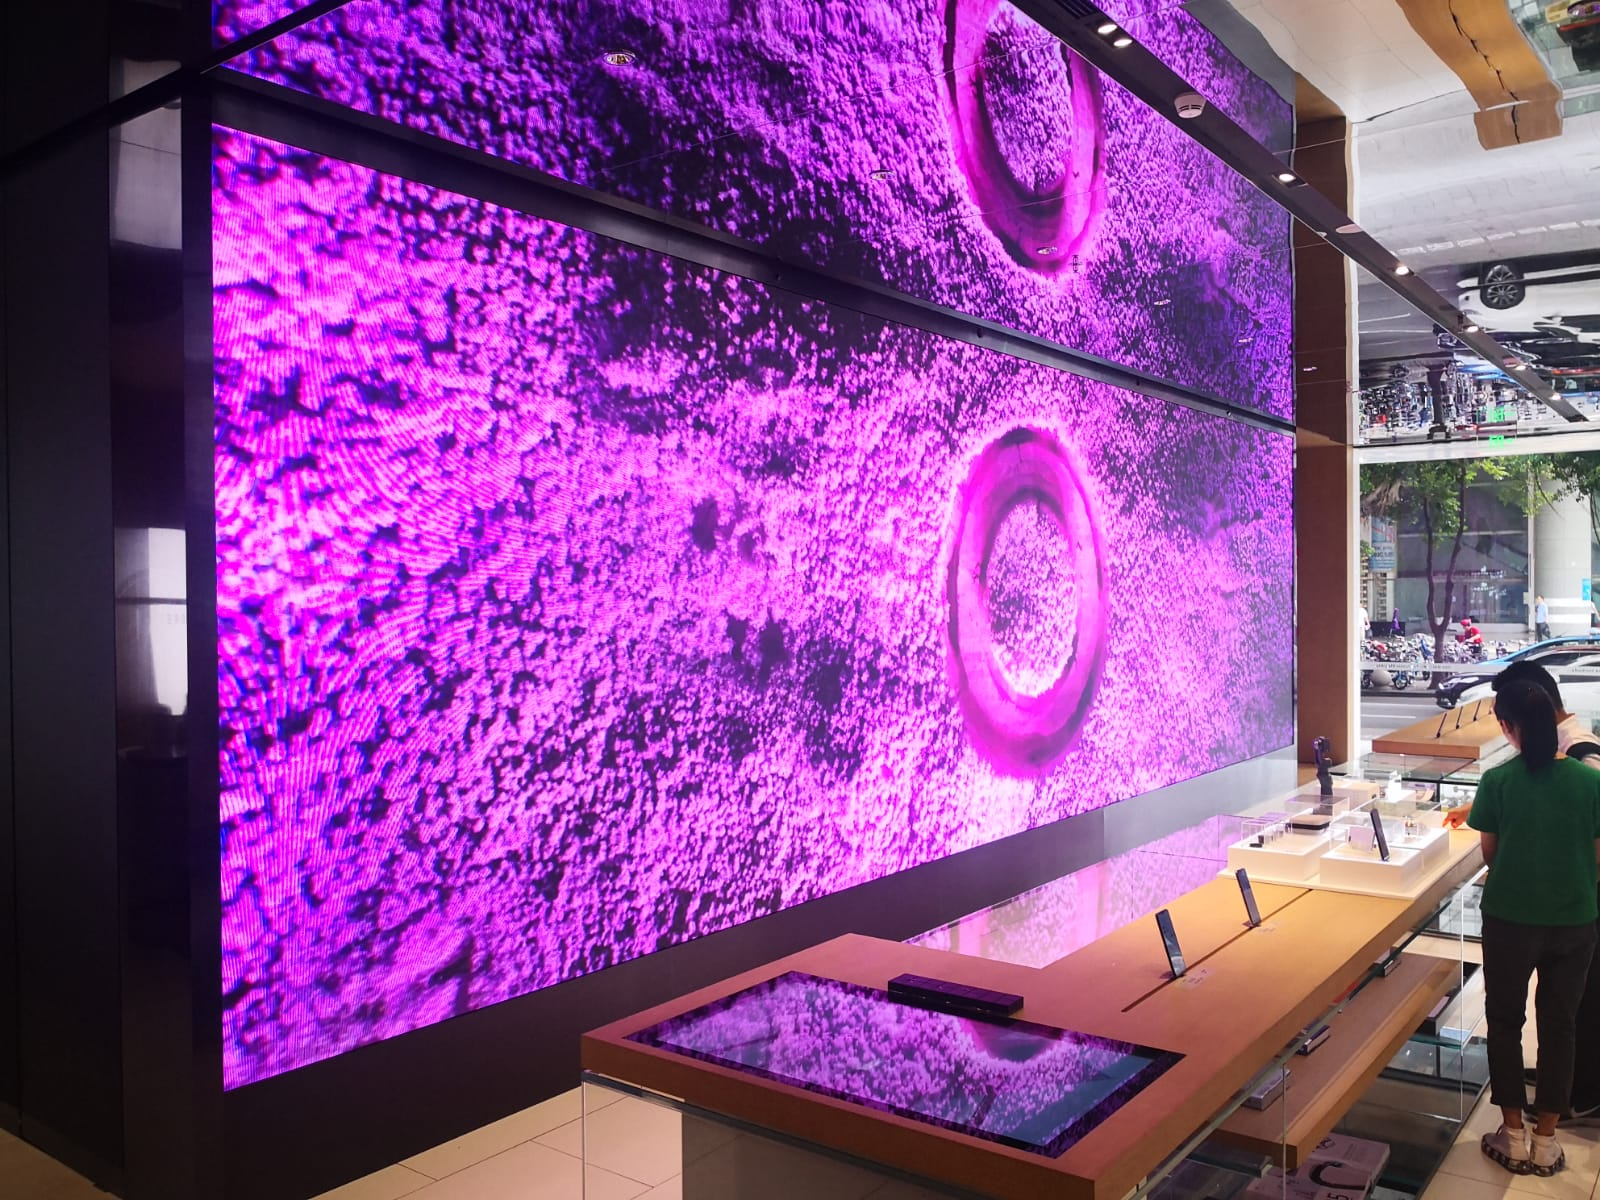 Wall mounted screen display